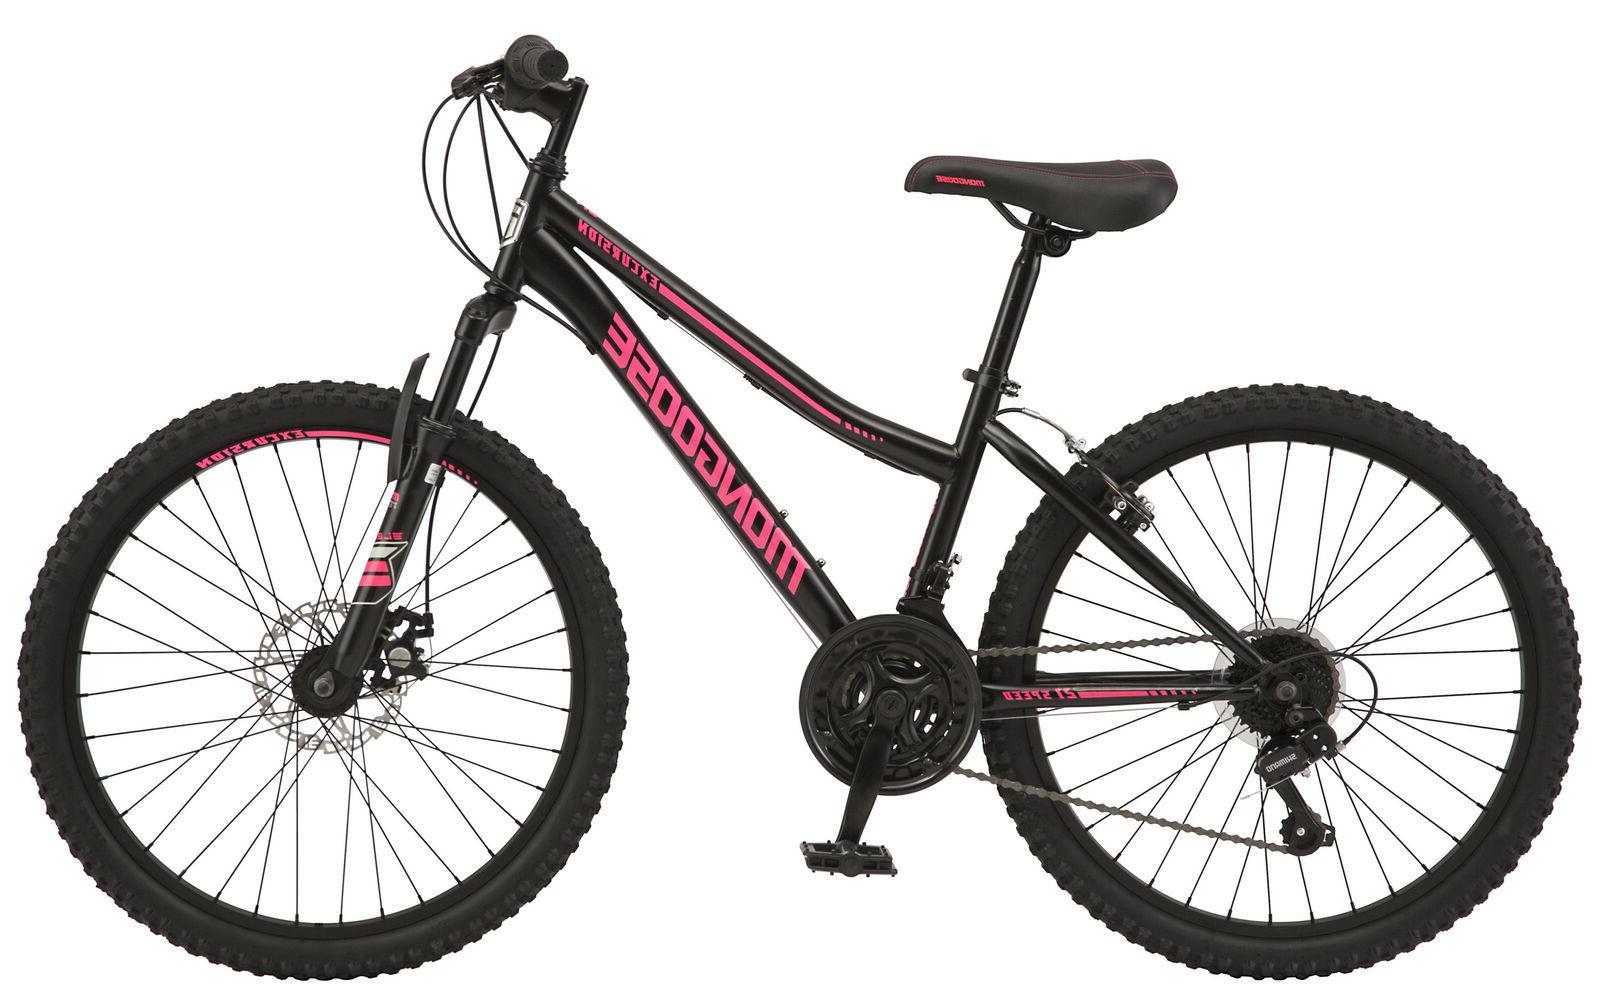 "New Excursion Girl Mountain Bike, - BLACK/PINK ""SHIP FAST"""